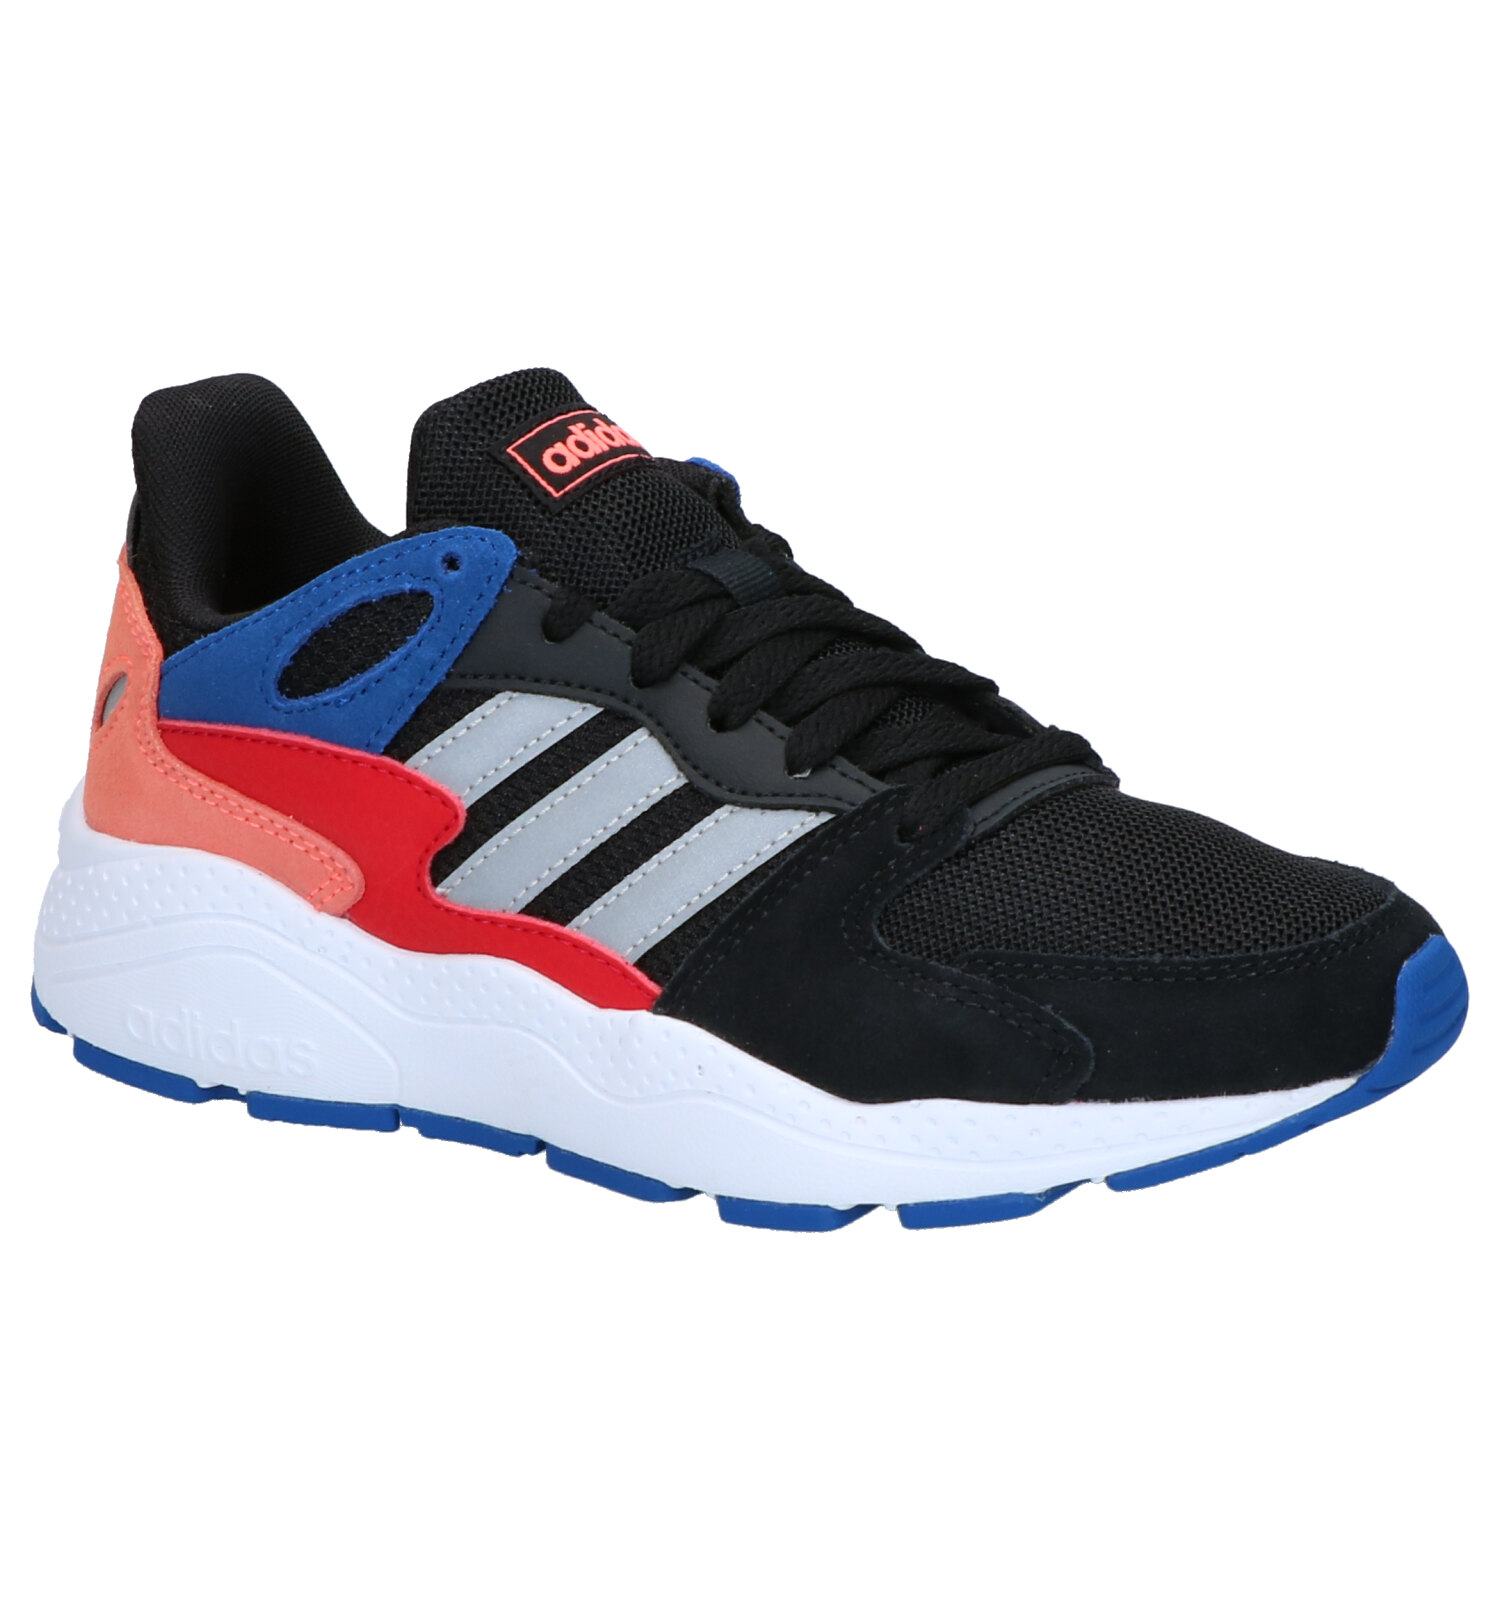 adidas Crazychaos Zwarte Sneakers | SCHOENENTORFS.NL | Gratis verzend en retour